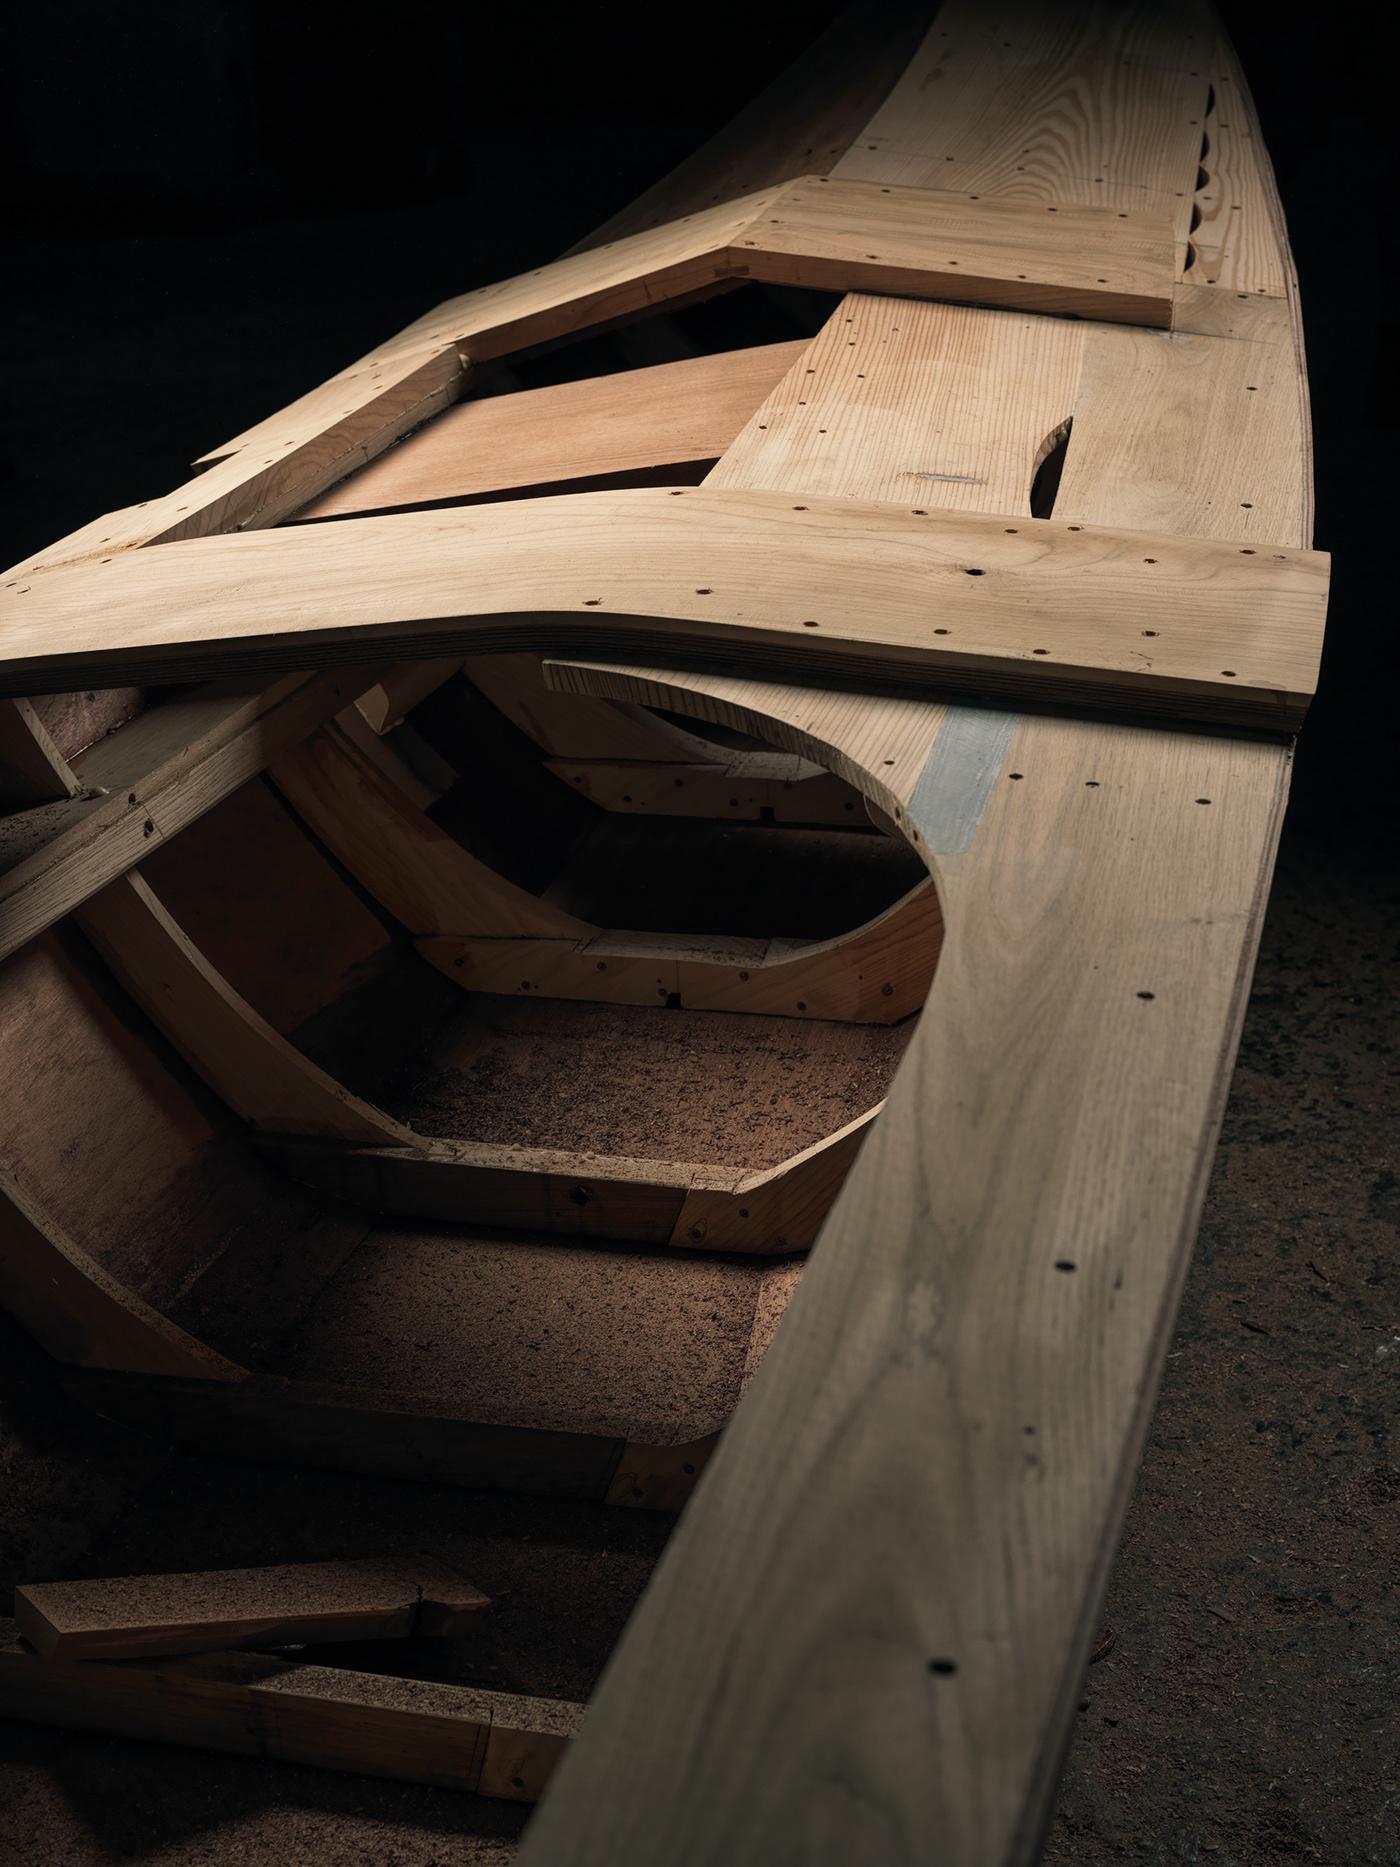 gondola #gondola400 Squero Craftmanship MADEINITALY handcraft digitalmovie matteomescalchin boat venezia